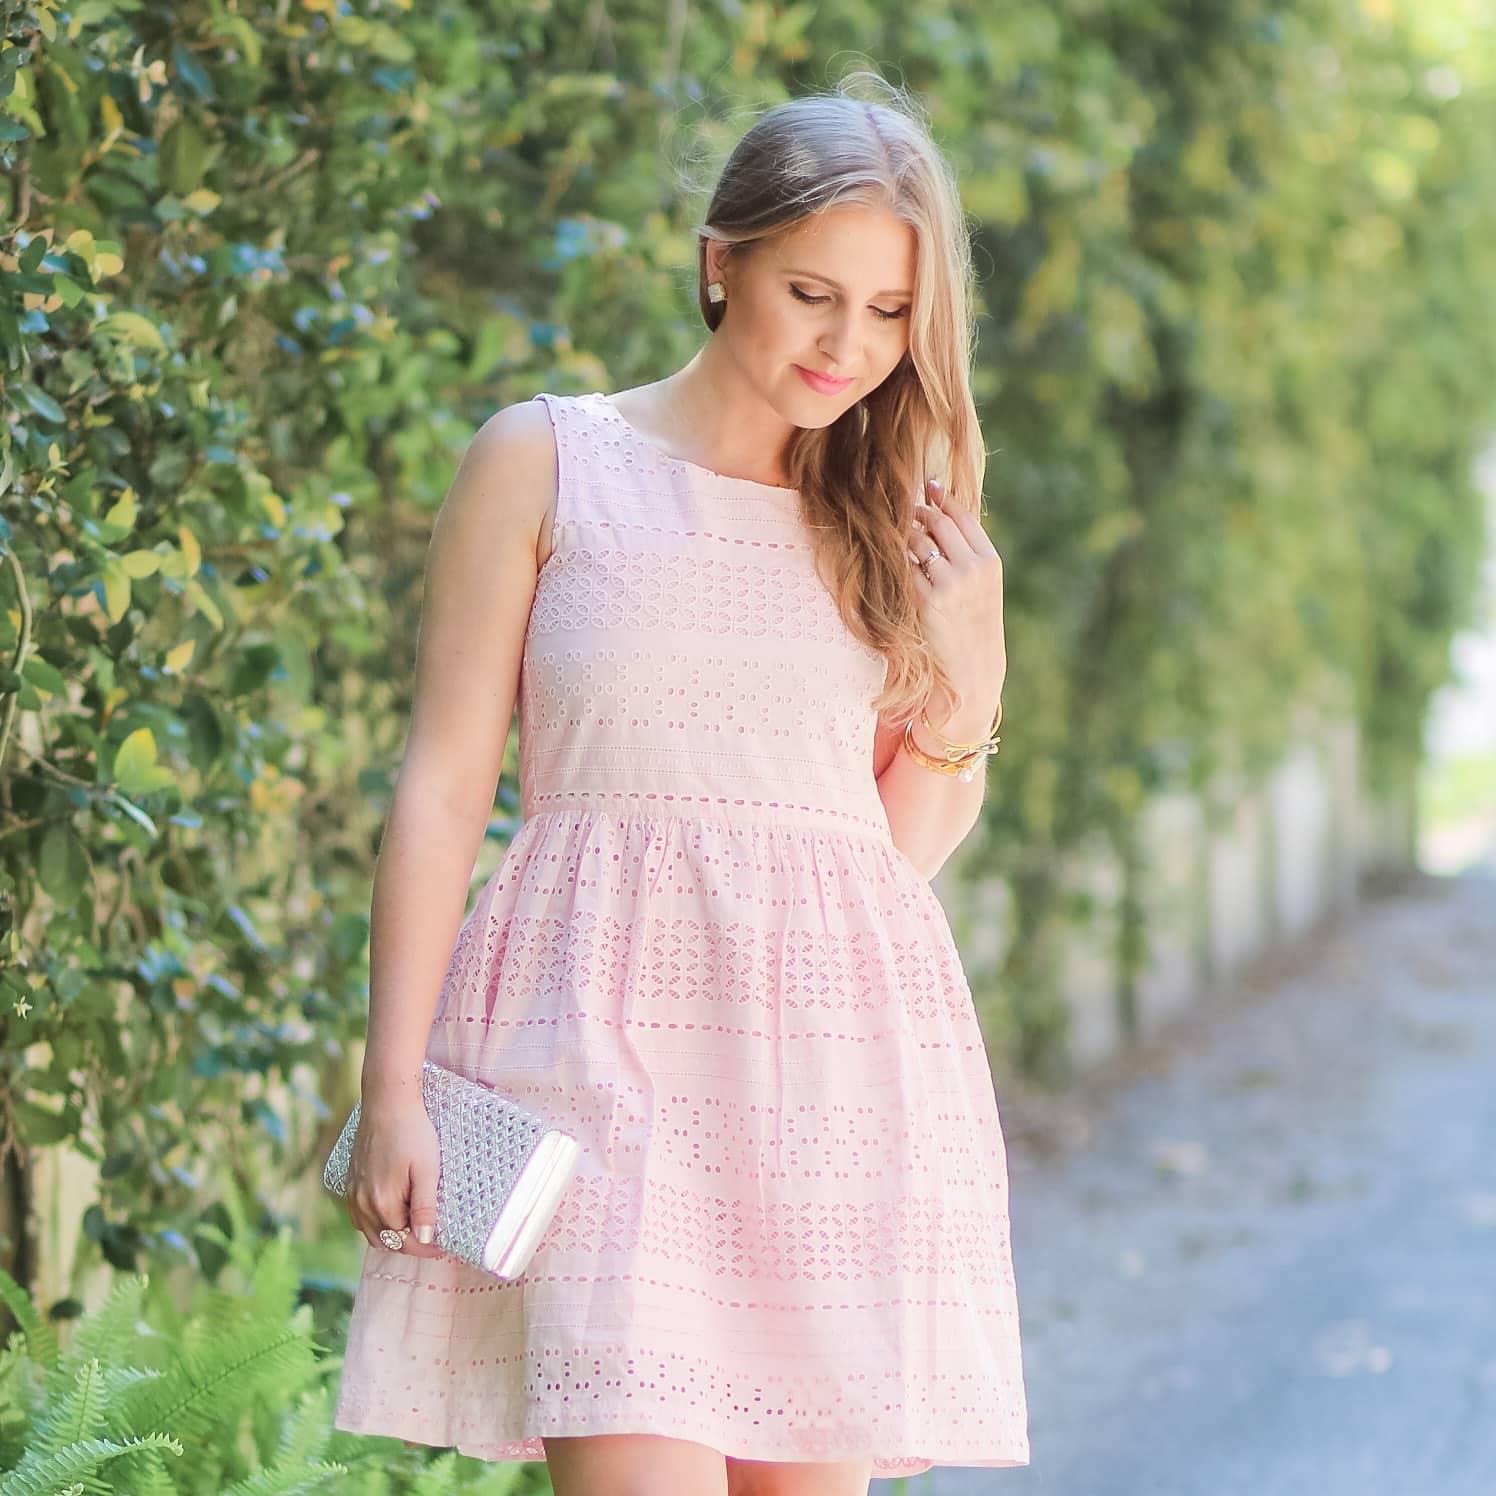 Summer Wedding Suit Ideas For Guest: Summer Wedding Guest Outfit Idea